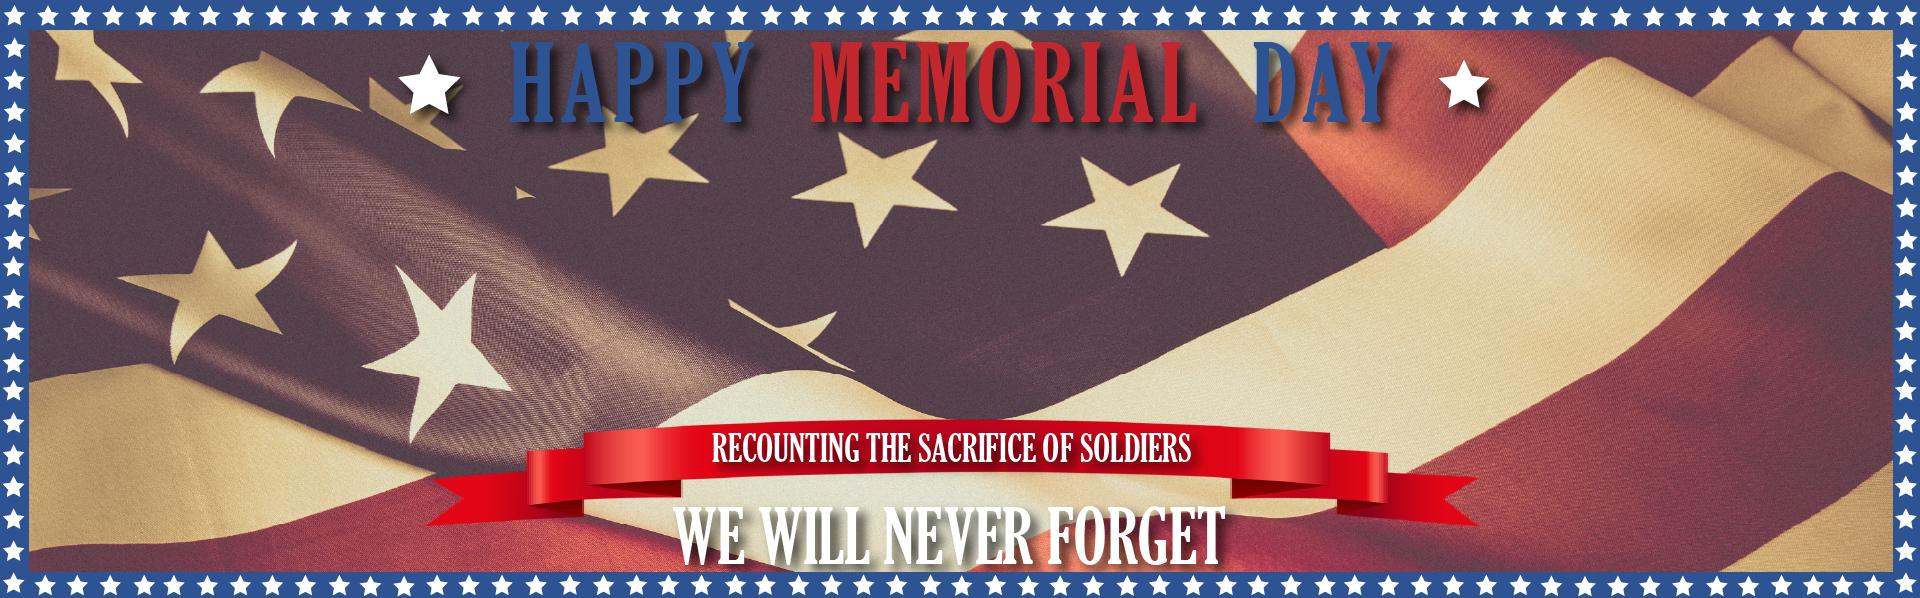 Memorial Day Hero Image NEW FIXED